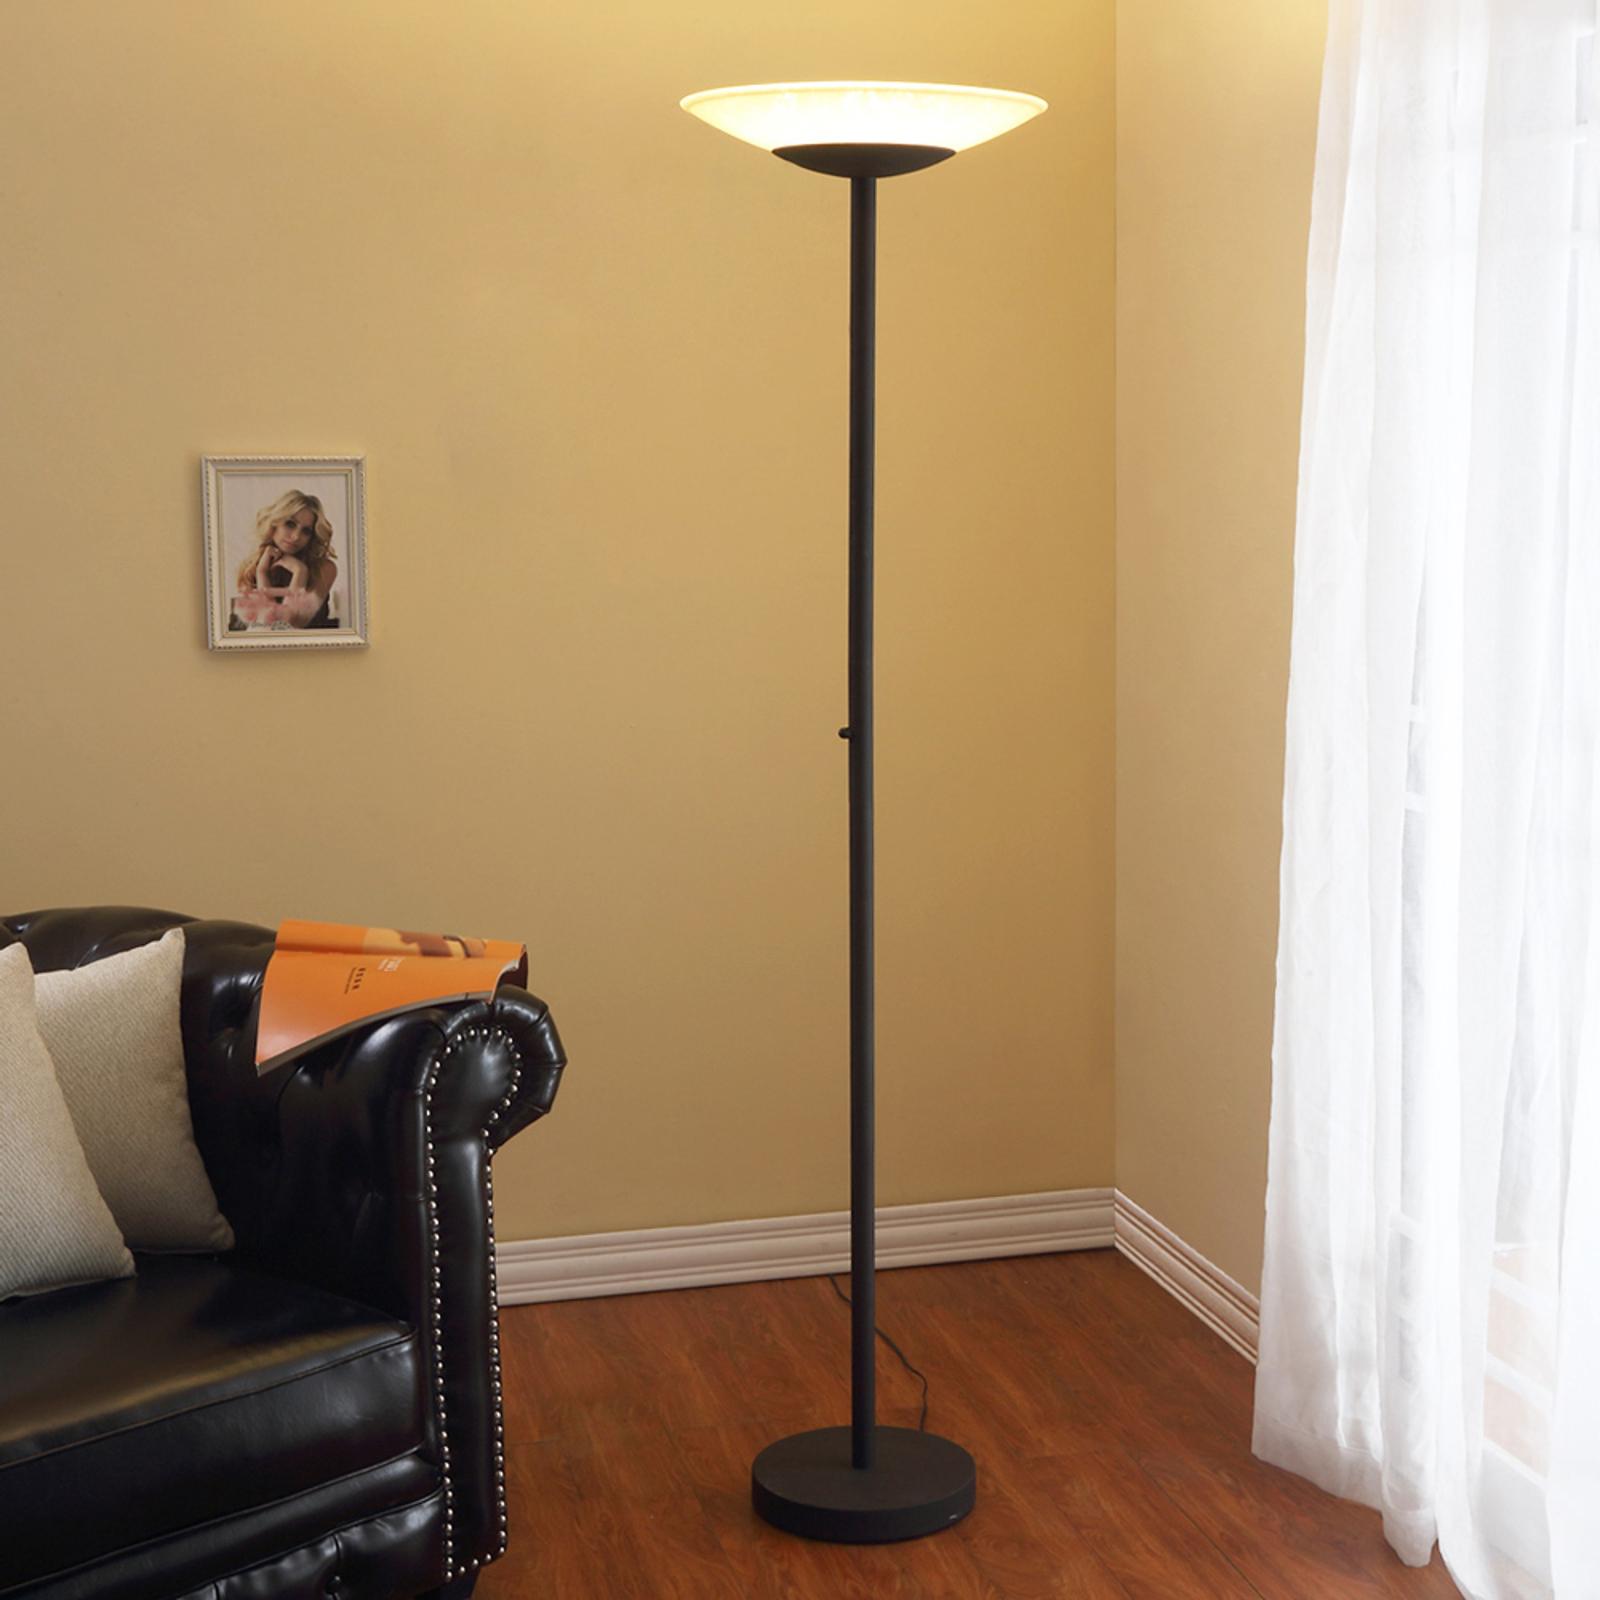 LED uplighter Ragna met dimmer, roestkleurig